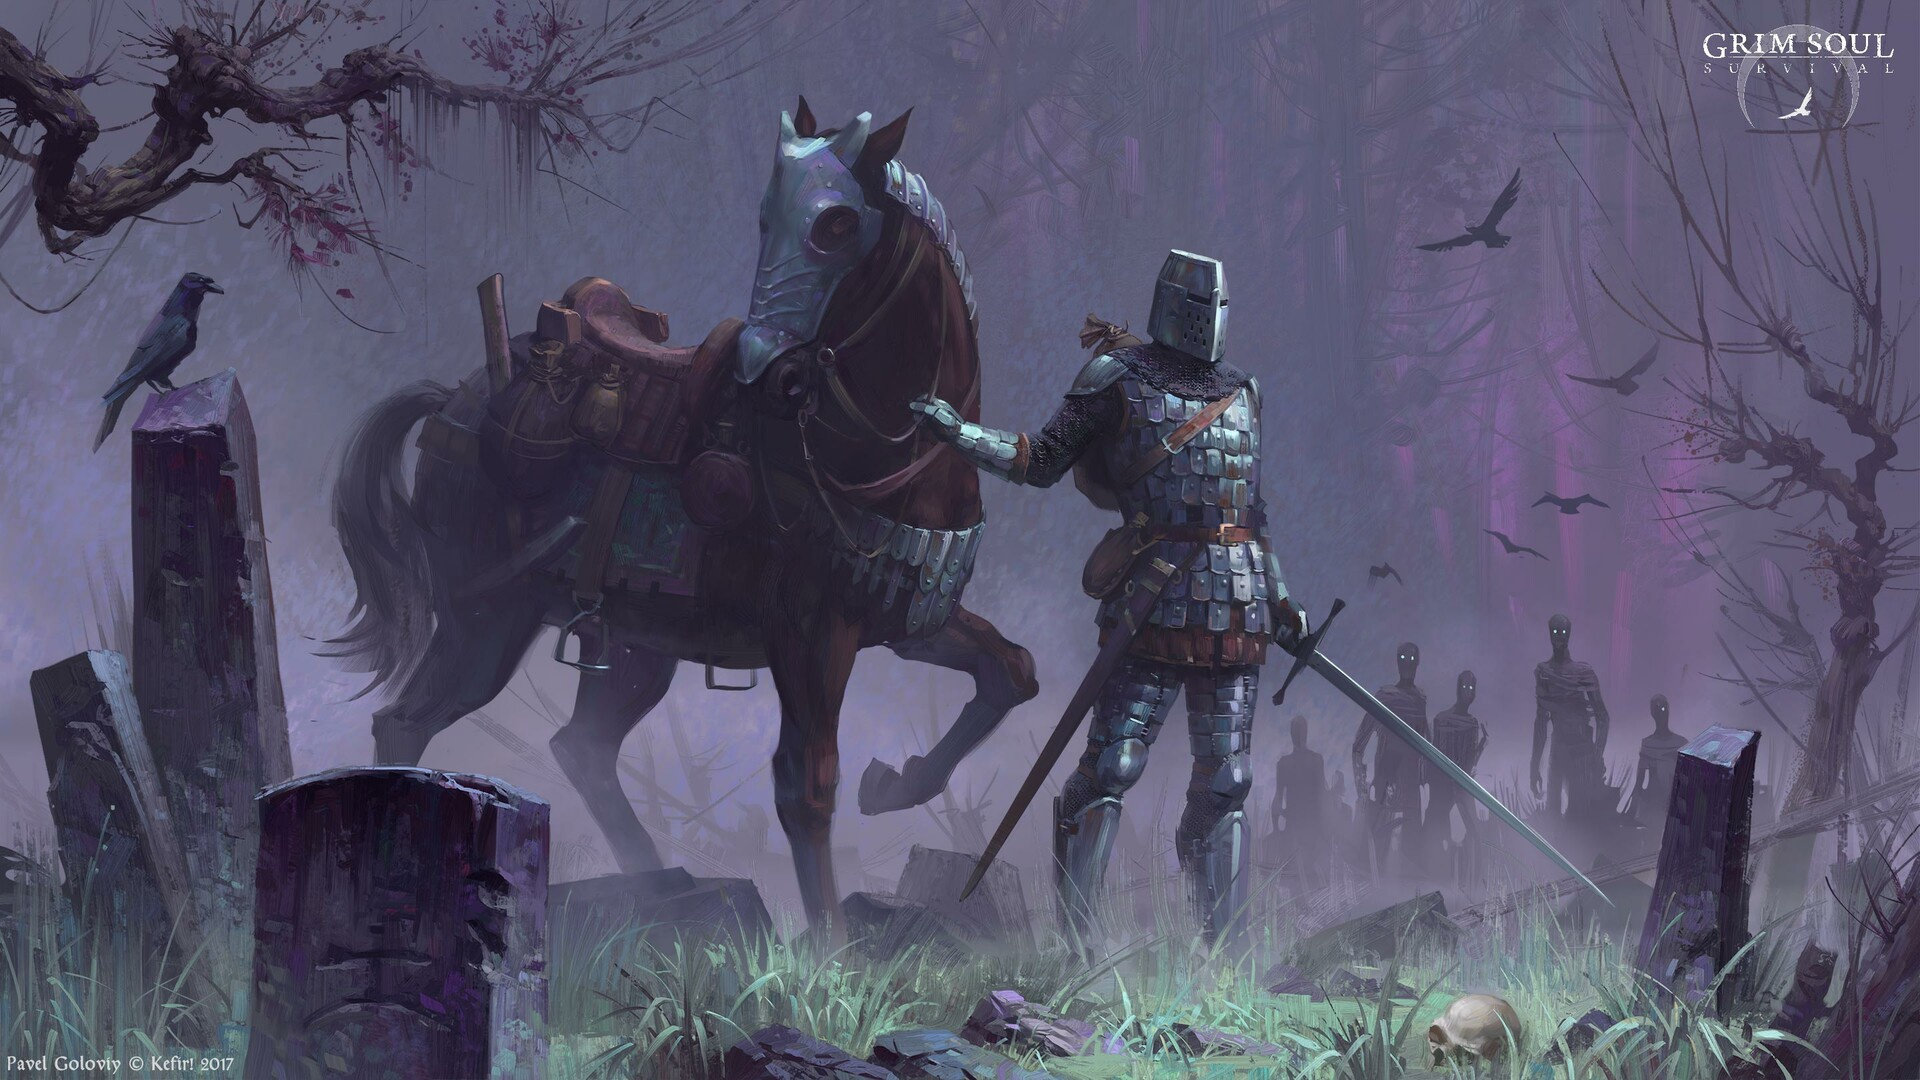 General 1920x1080 medieval illustration fantasy art Gentleman warrior digital Grim Souls video game art